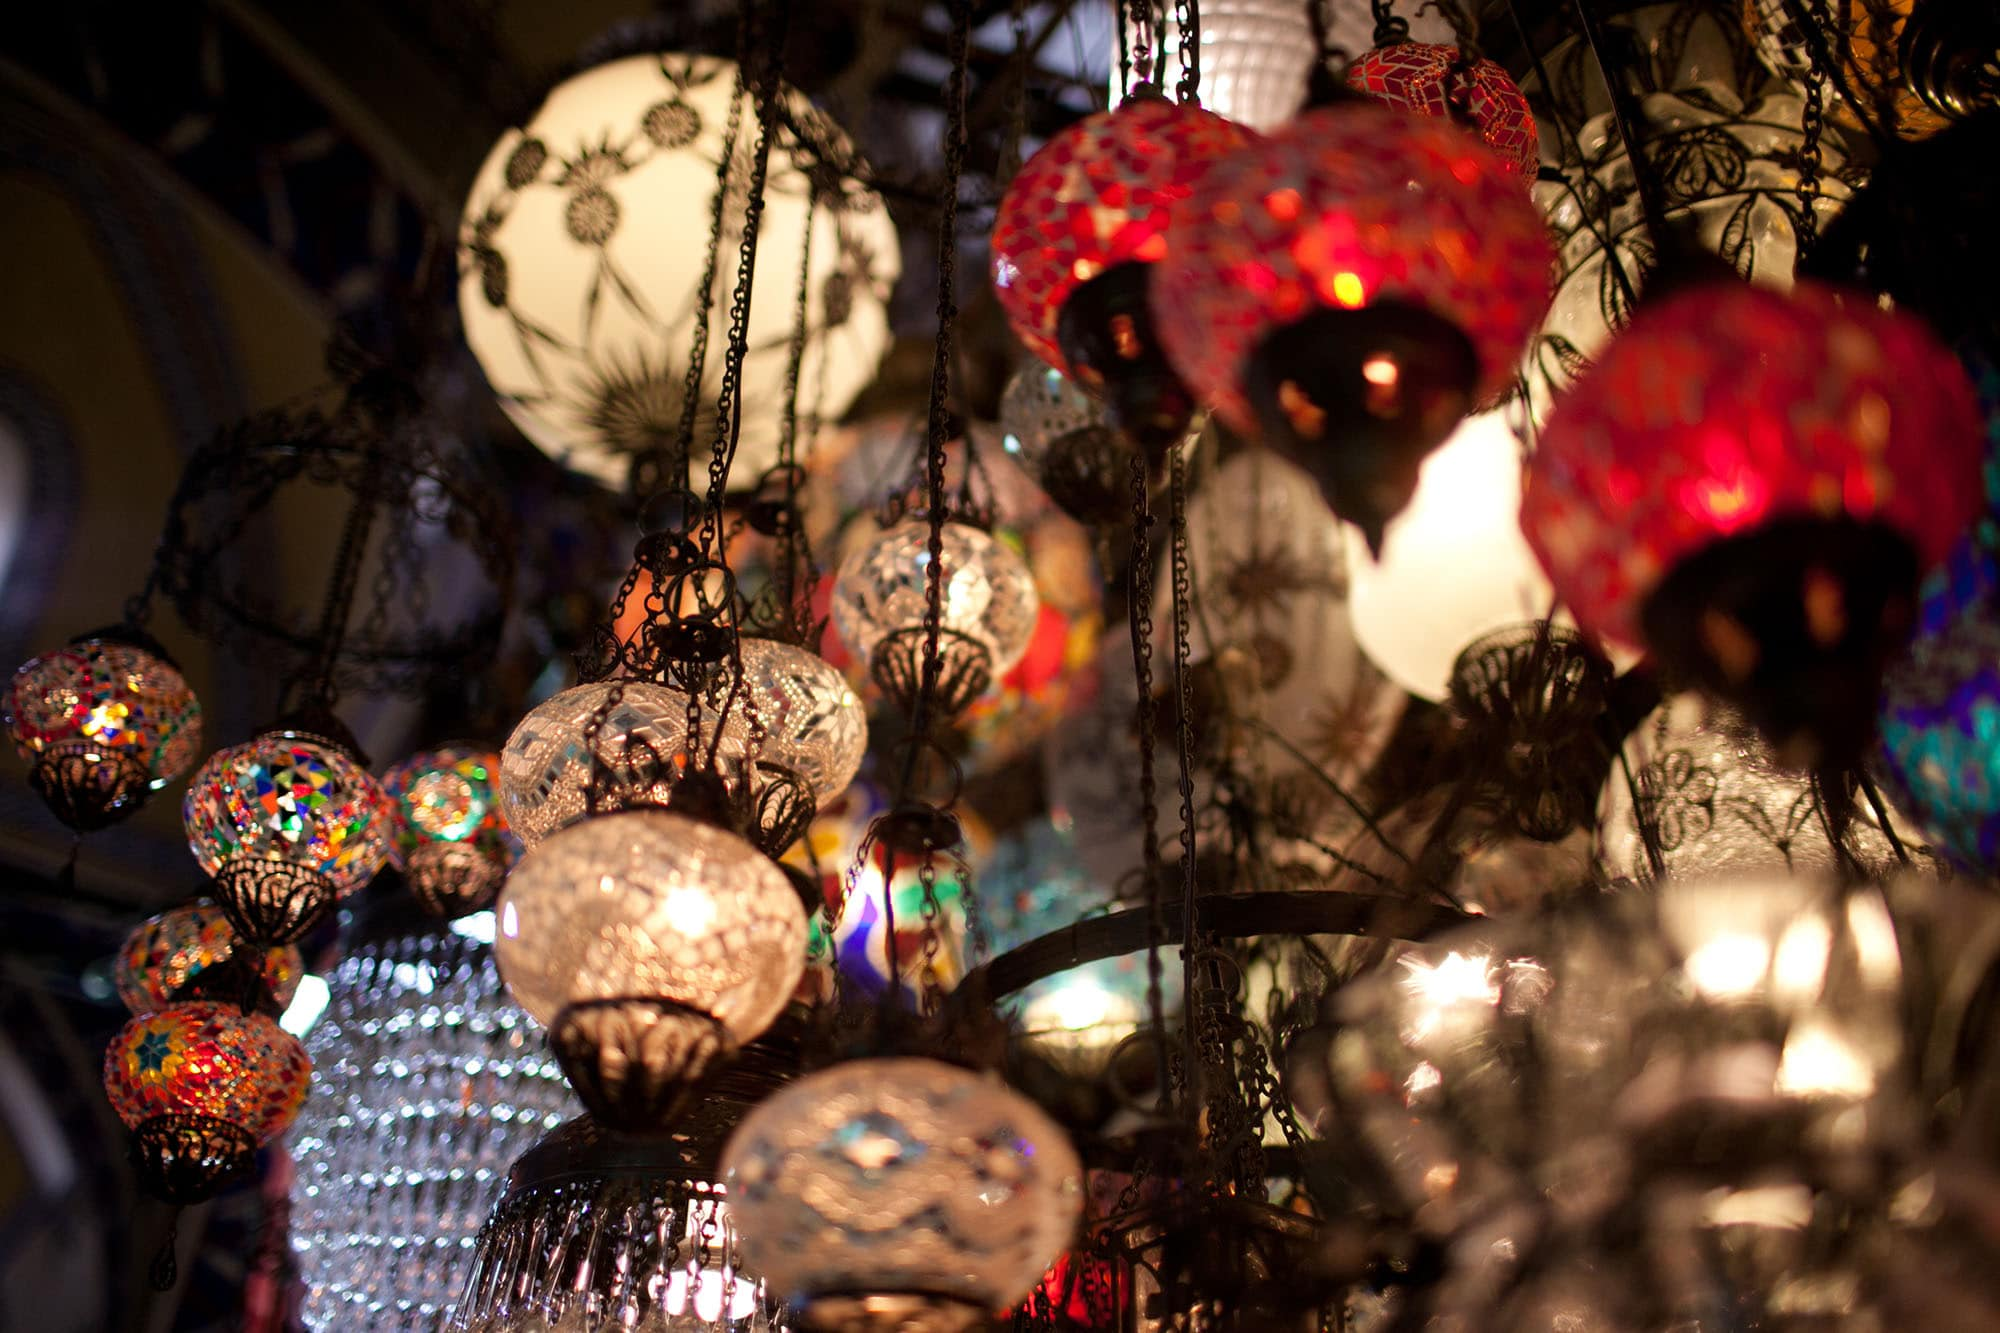 Grand Bazaar in Istanbul, Turkey.